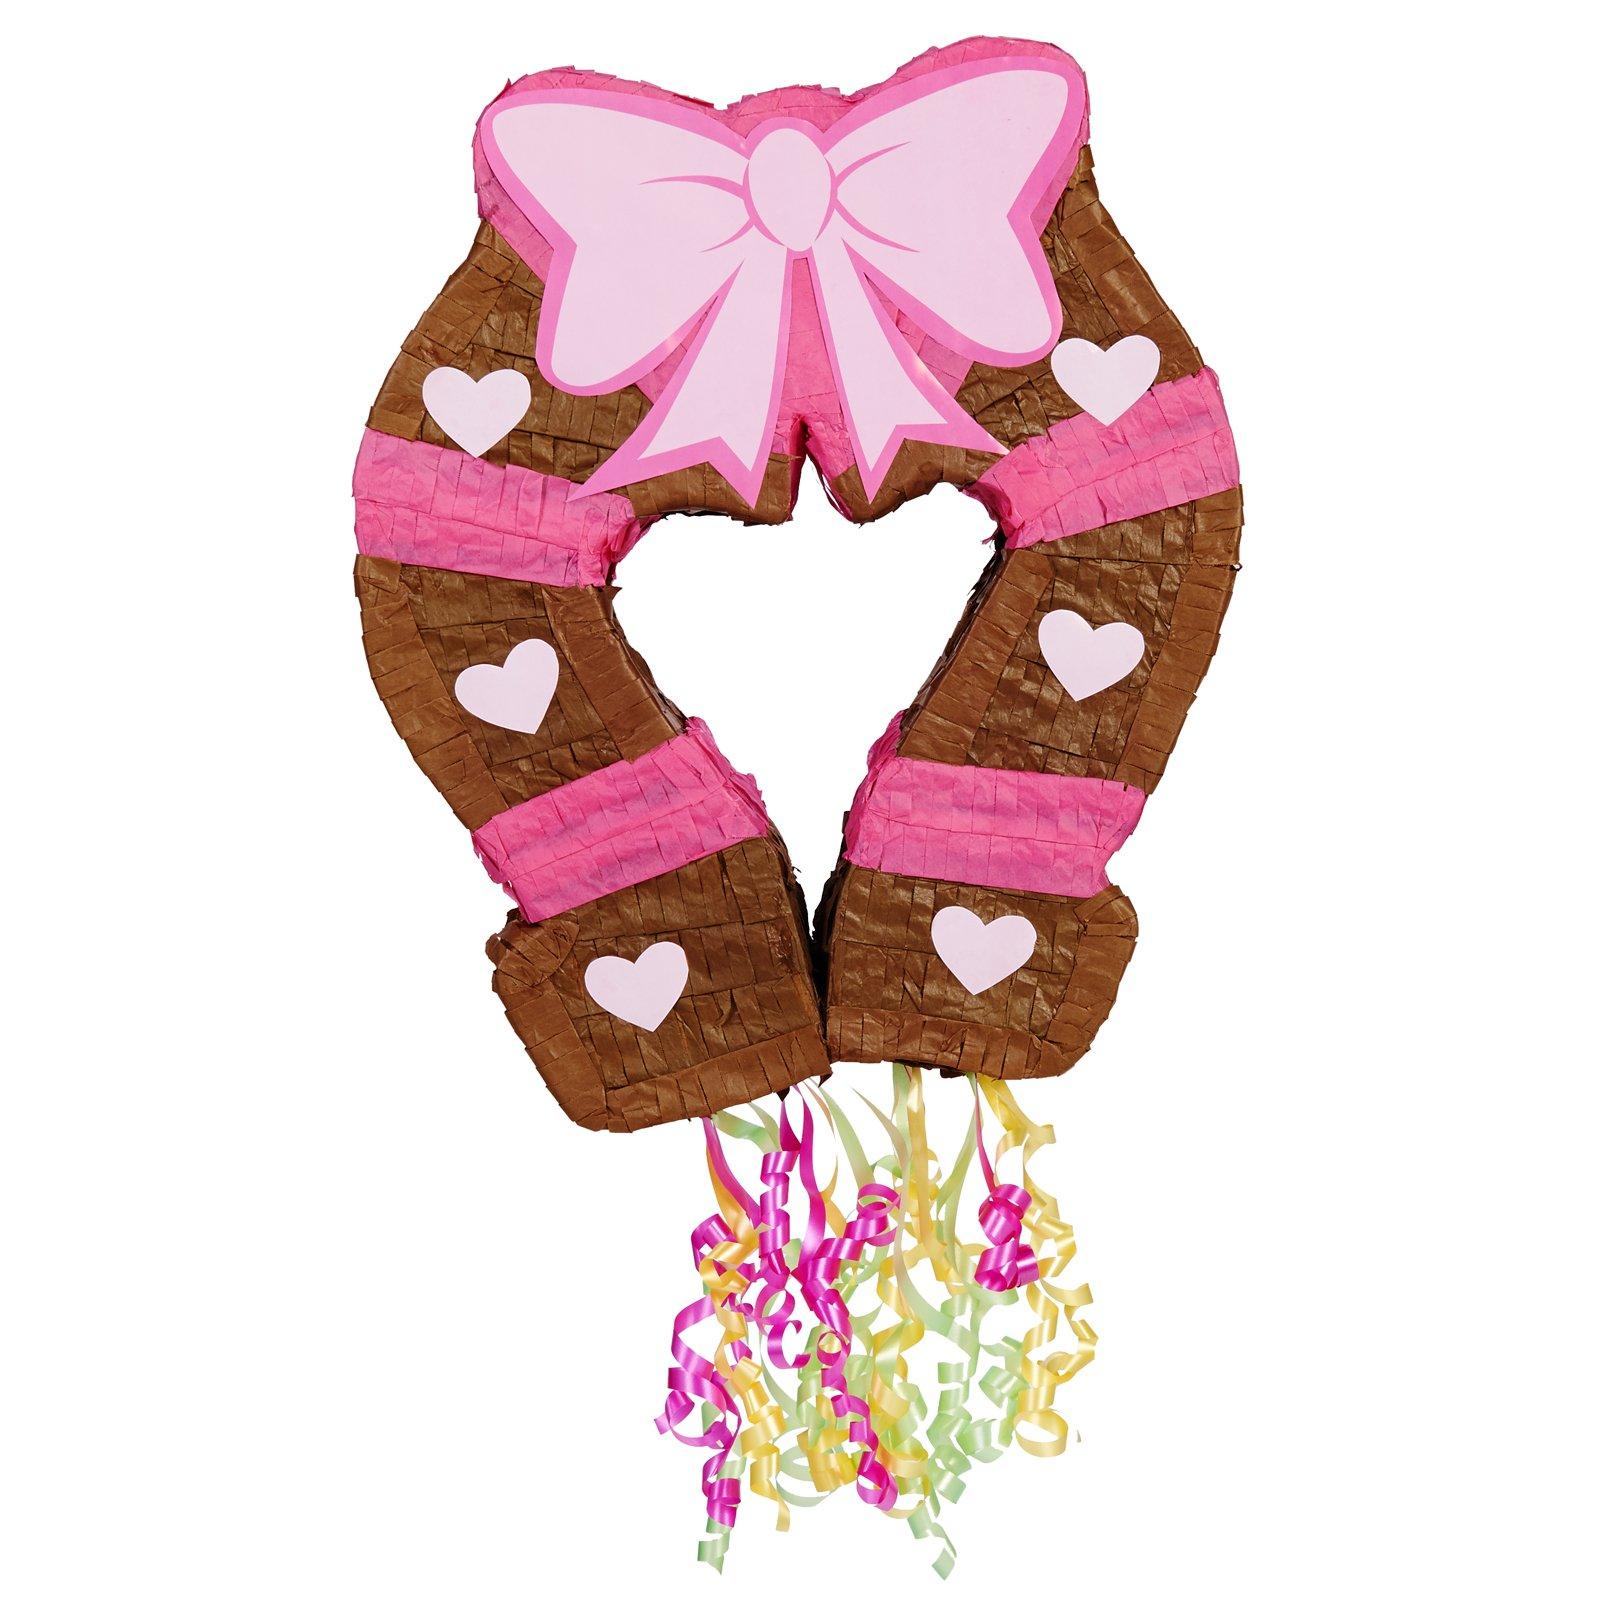 BirthdayExpress Pink Cowgirl Party Supplies - Horseshoe Pinata by BirthdayExpress